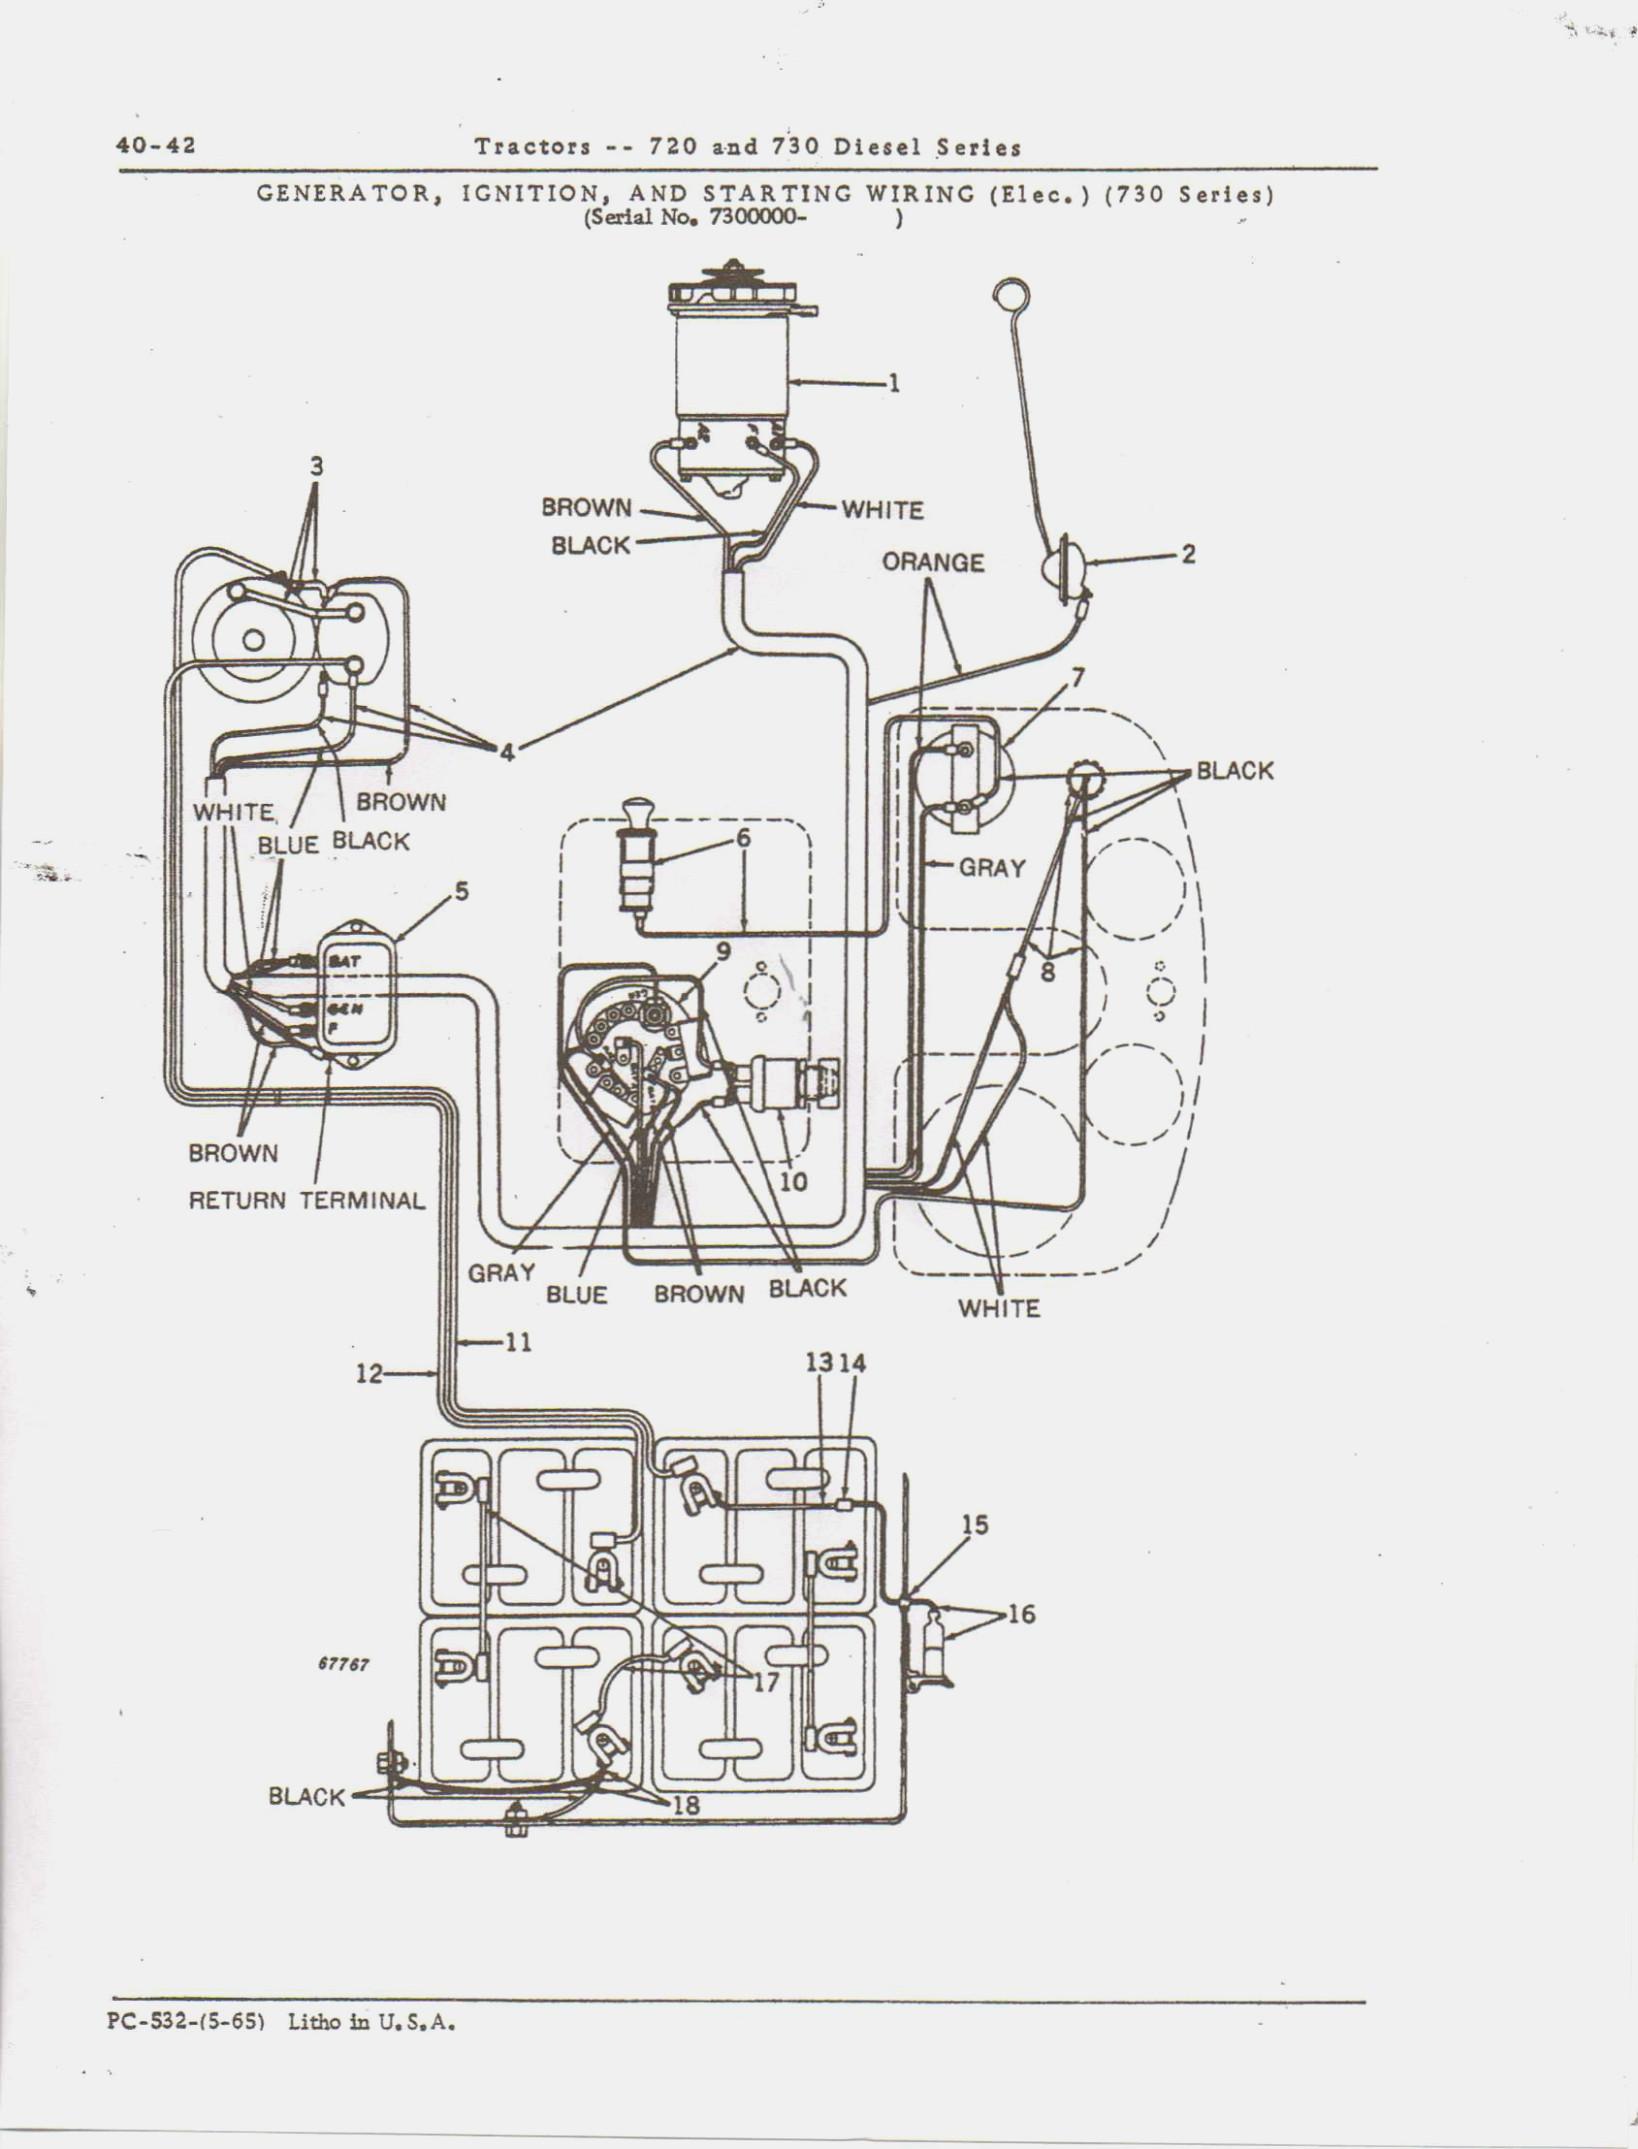 [NO_3383] John Deere 310C Backhoe Wiring Diagram John